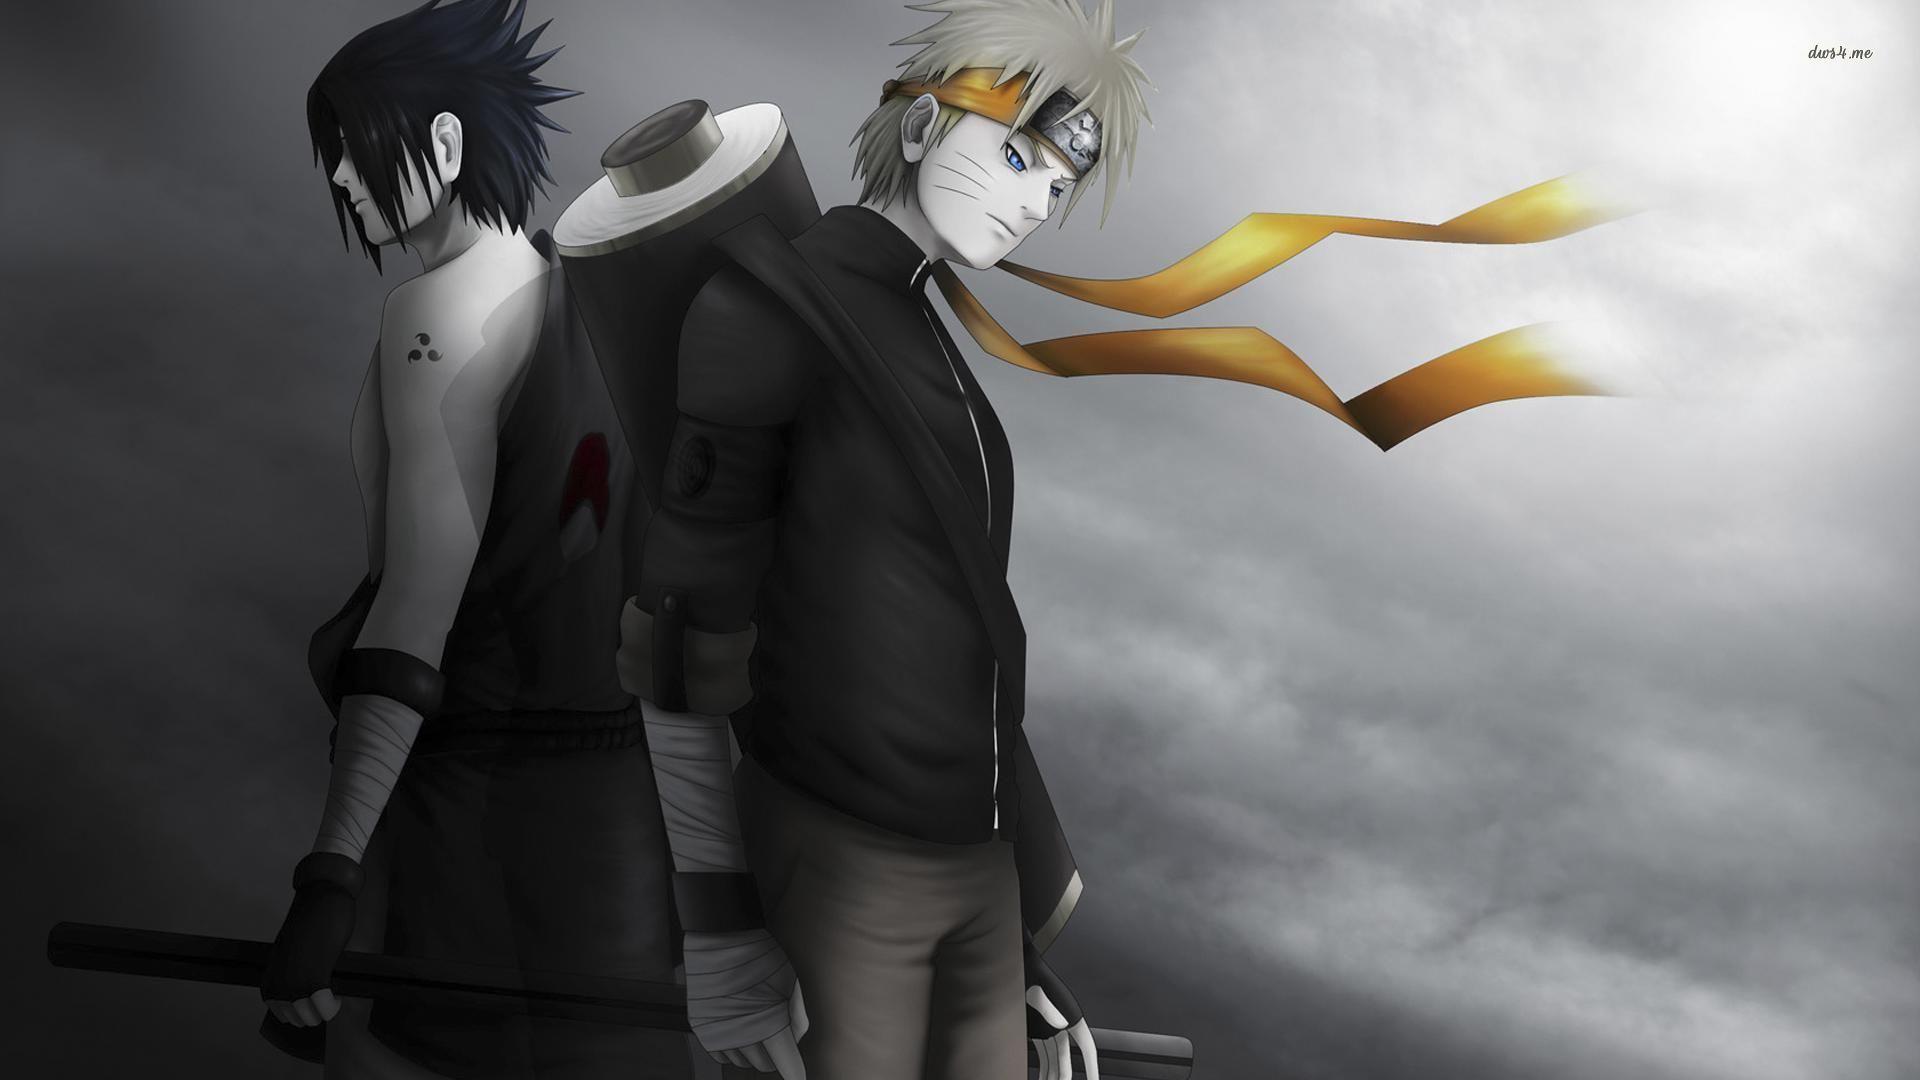 Naruto Uzumaki Wallpapers High Quality Download Free